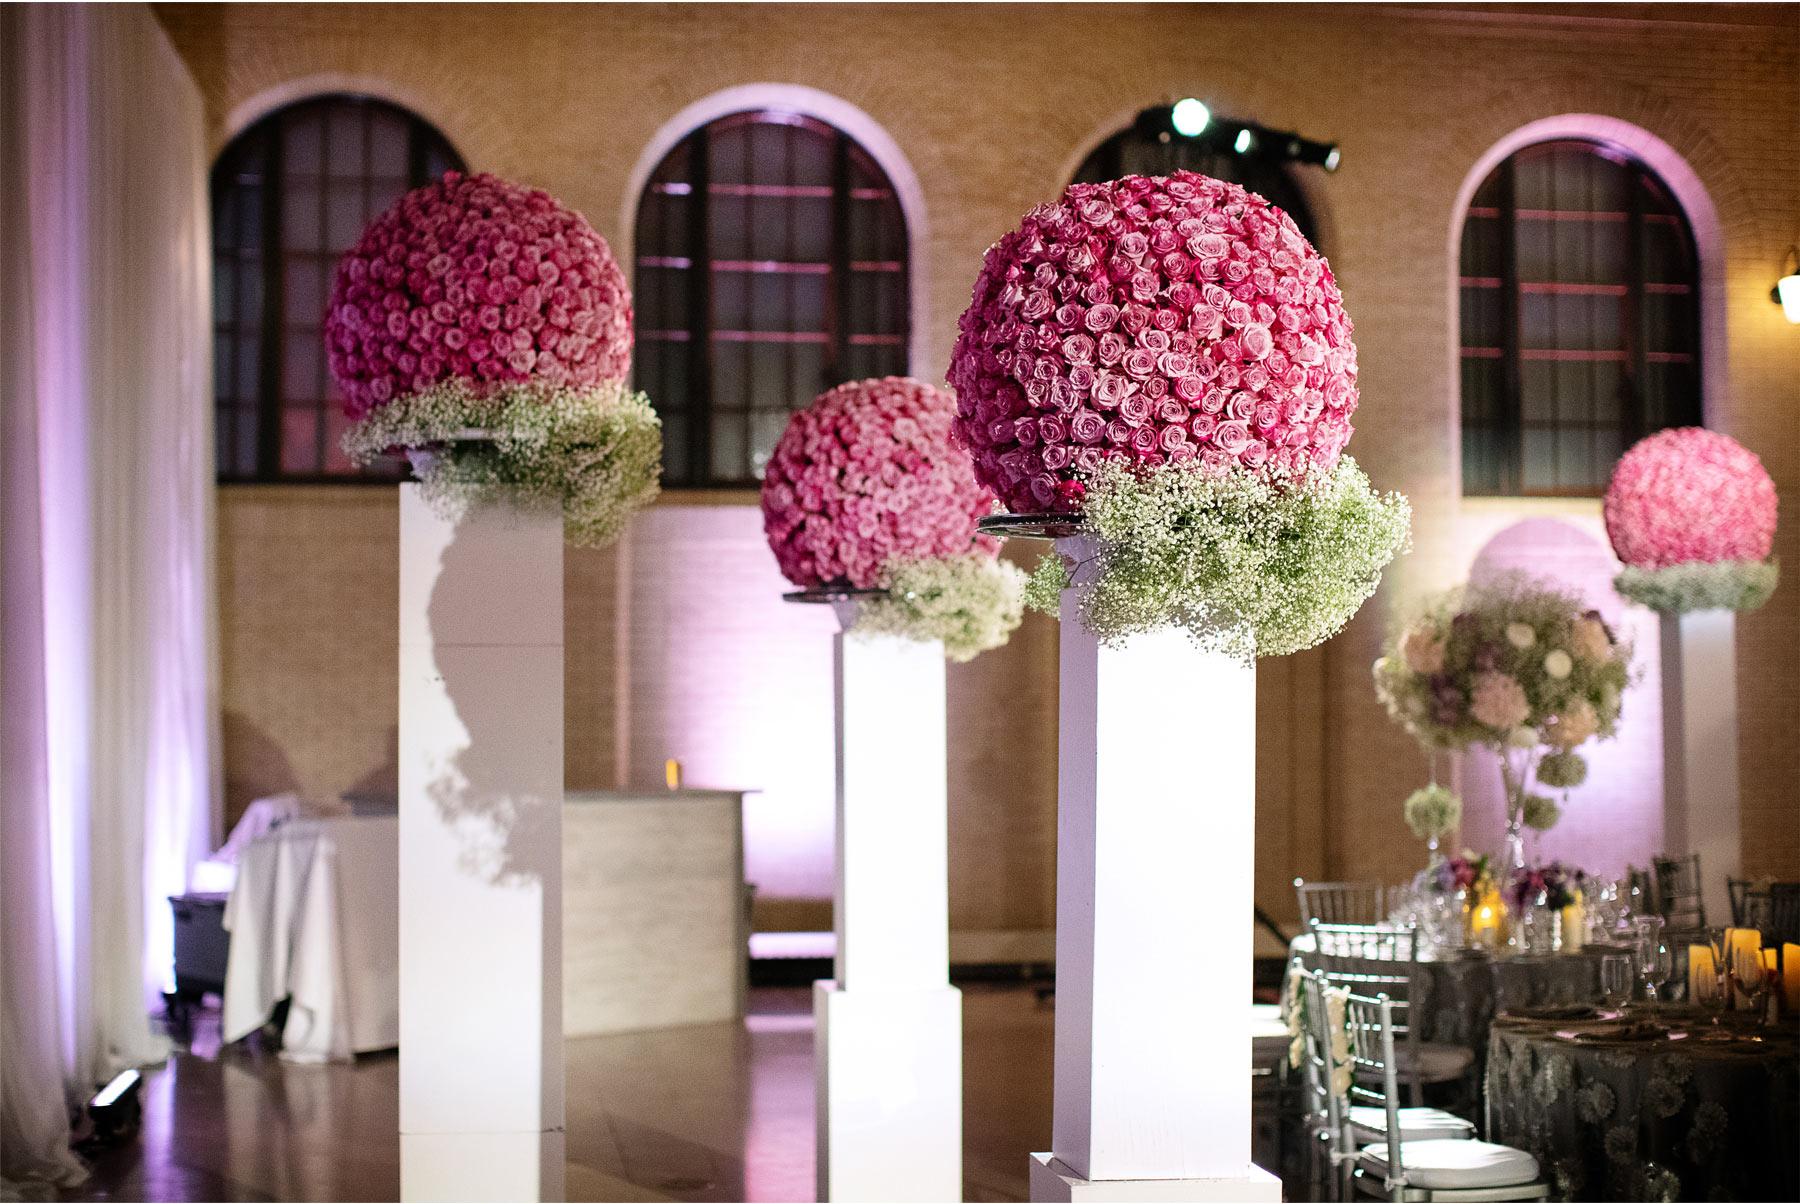 08-Andrew-Vick-Photography-My-Great-Big-Live-Wedding-with-David-Tutera-Behind-the-Scenes-Minnesota-Union-Depot-Saint-Paul-Flowers-Flower-Balls-Ceremony.jpg